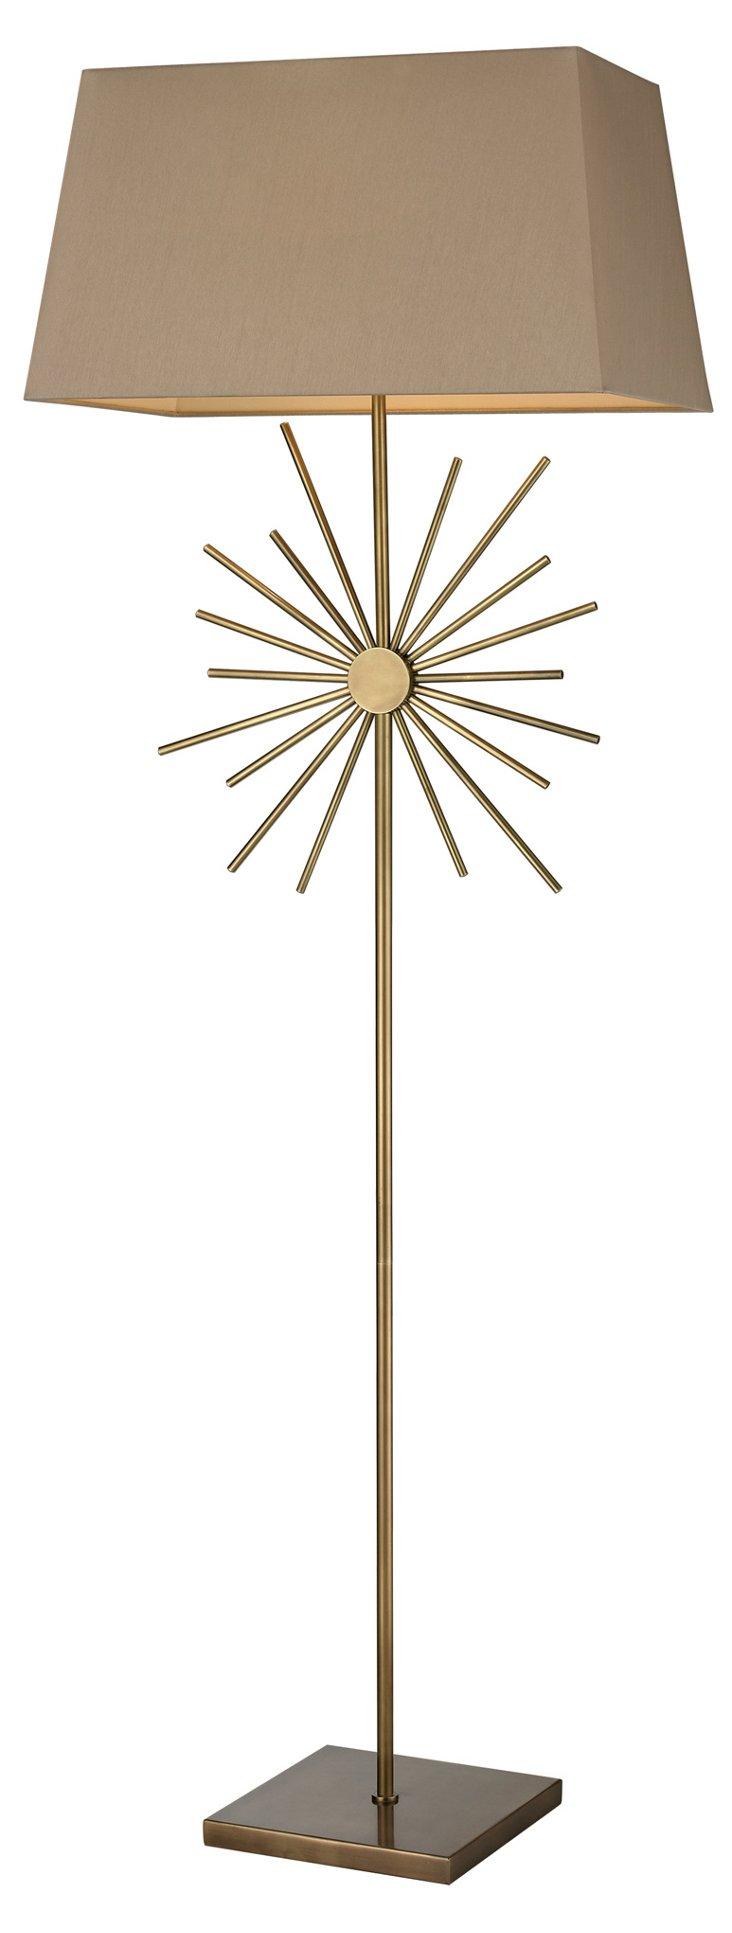 Starburst Floor Lamp, Antiqued Brass